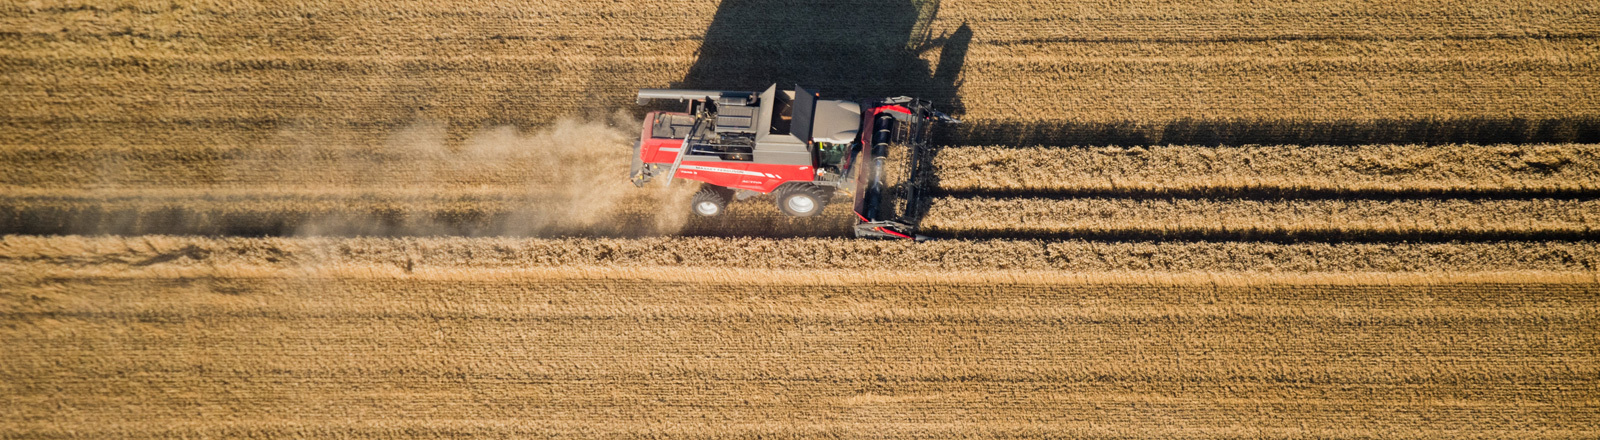 Ein Traktor mäht ein Feld.